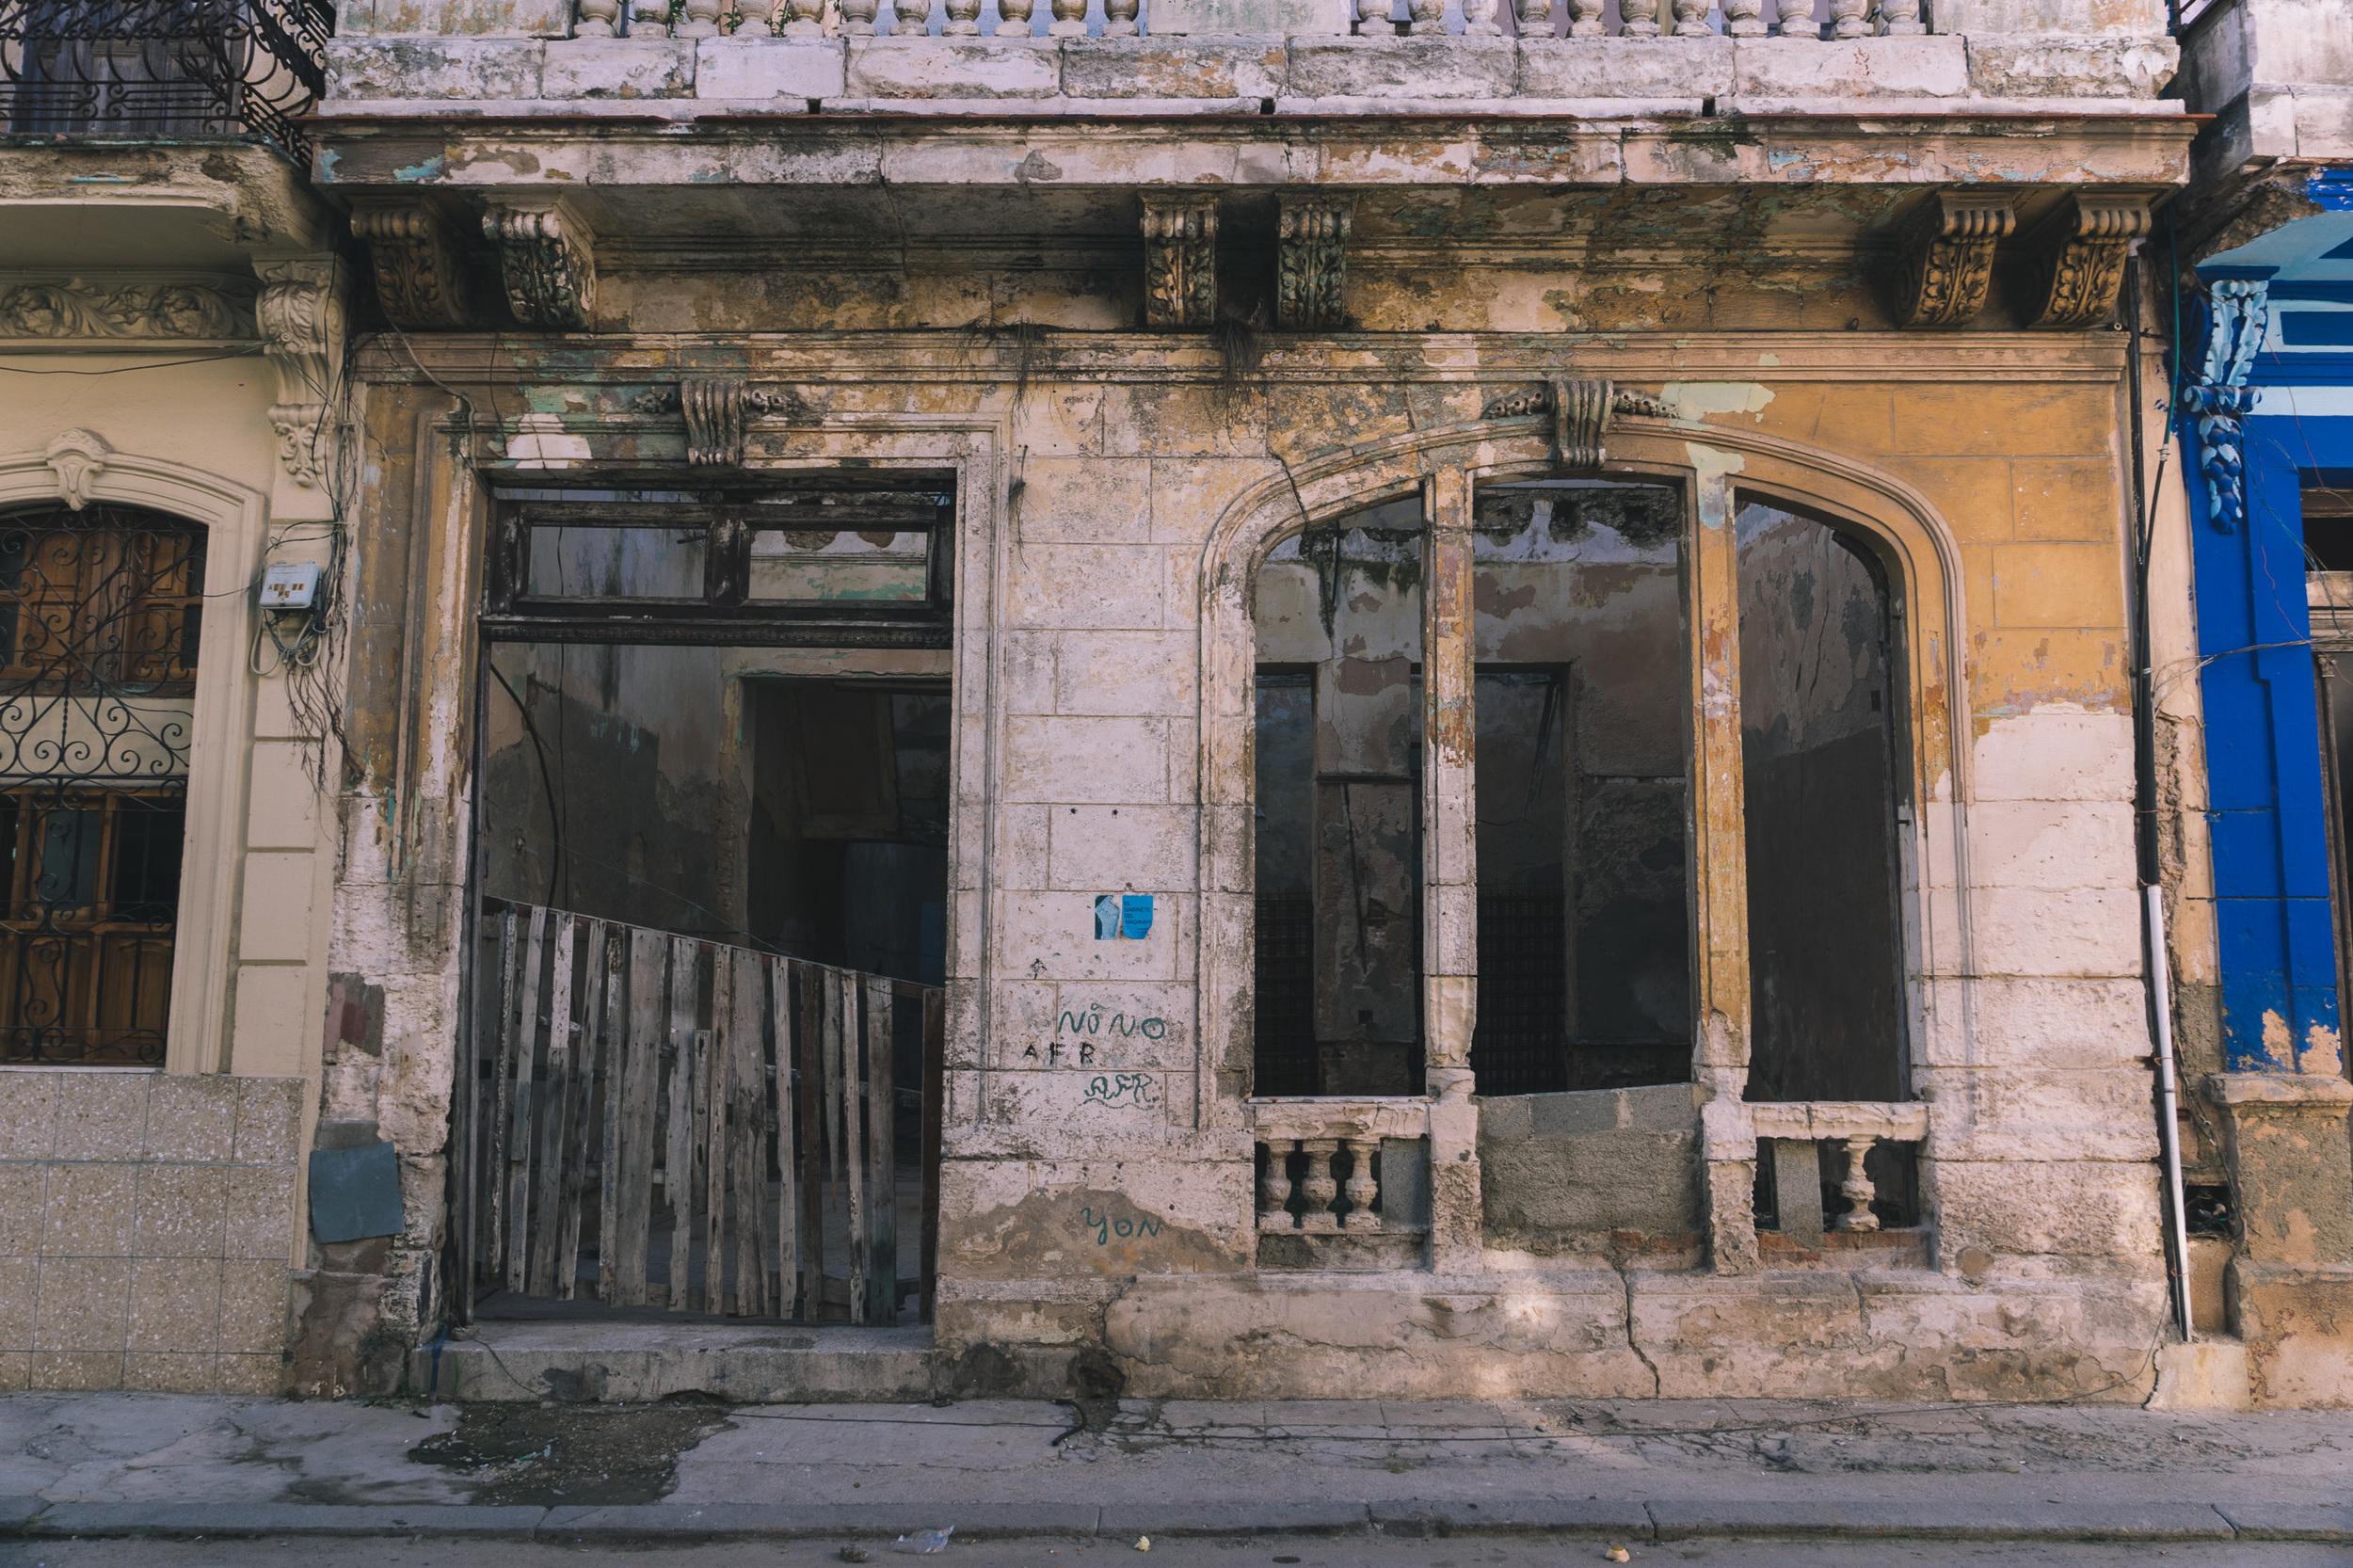 DeClaro-Photography-Cuba-02763.jpg